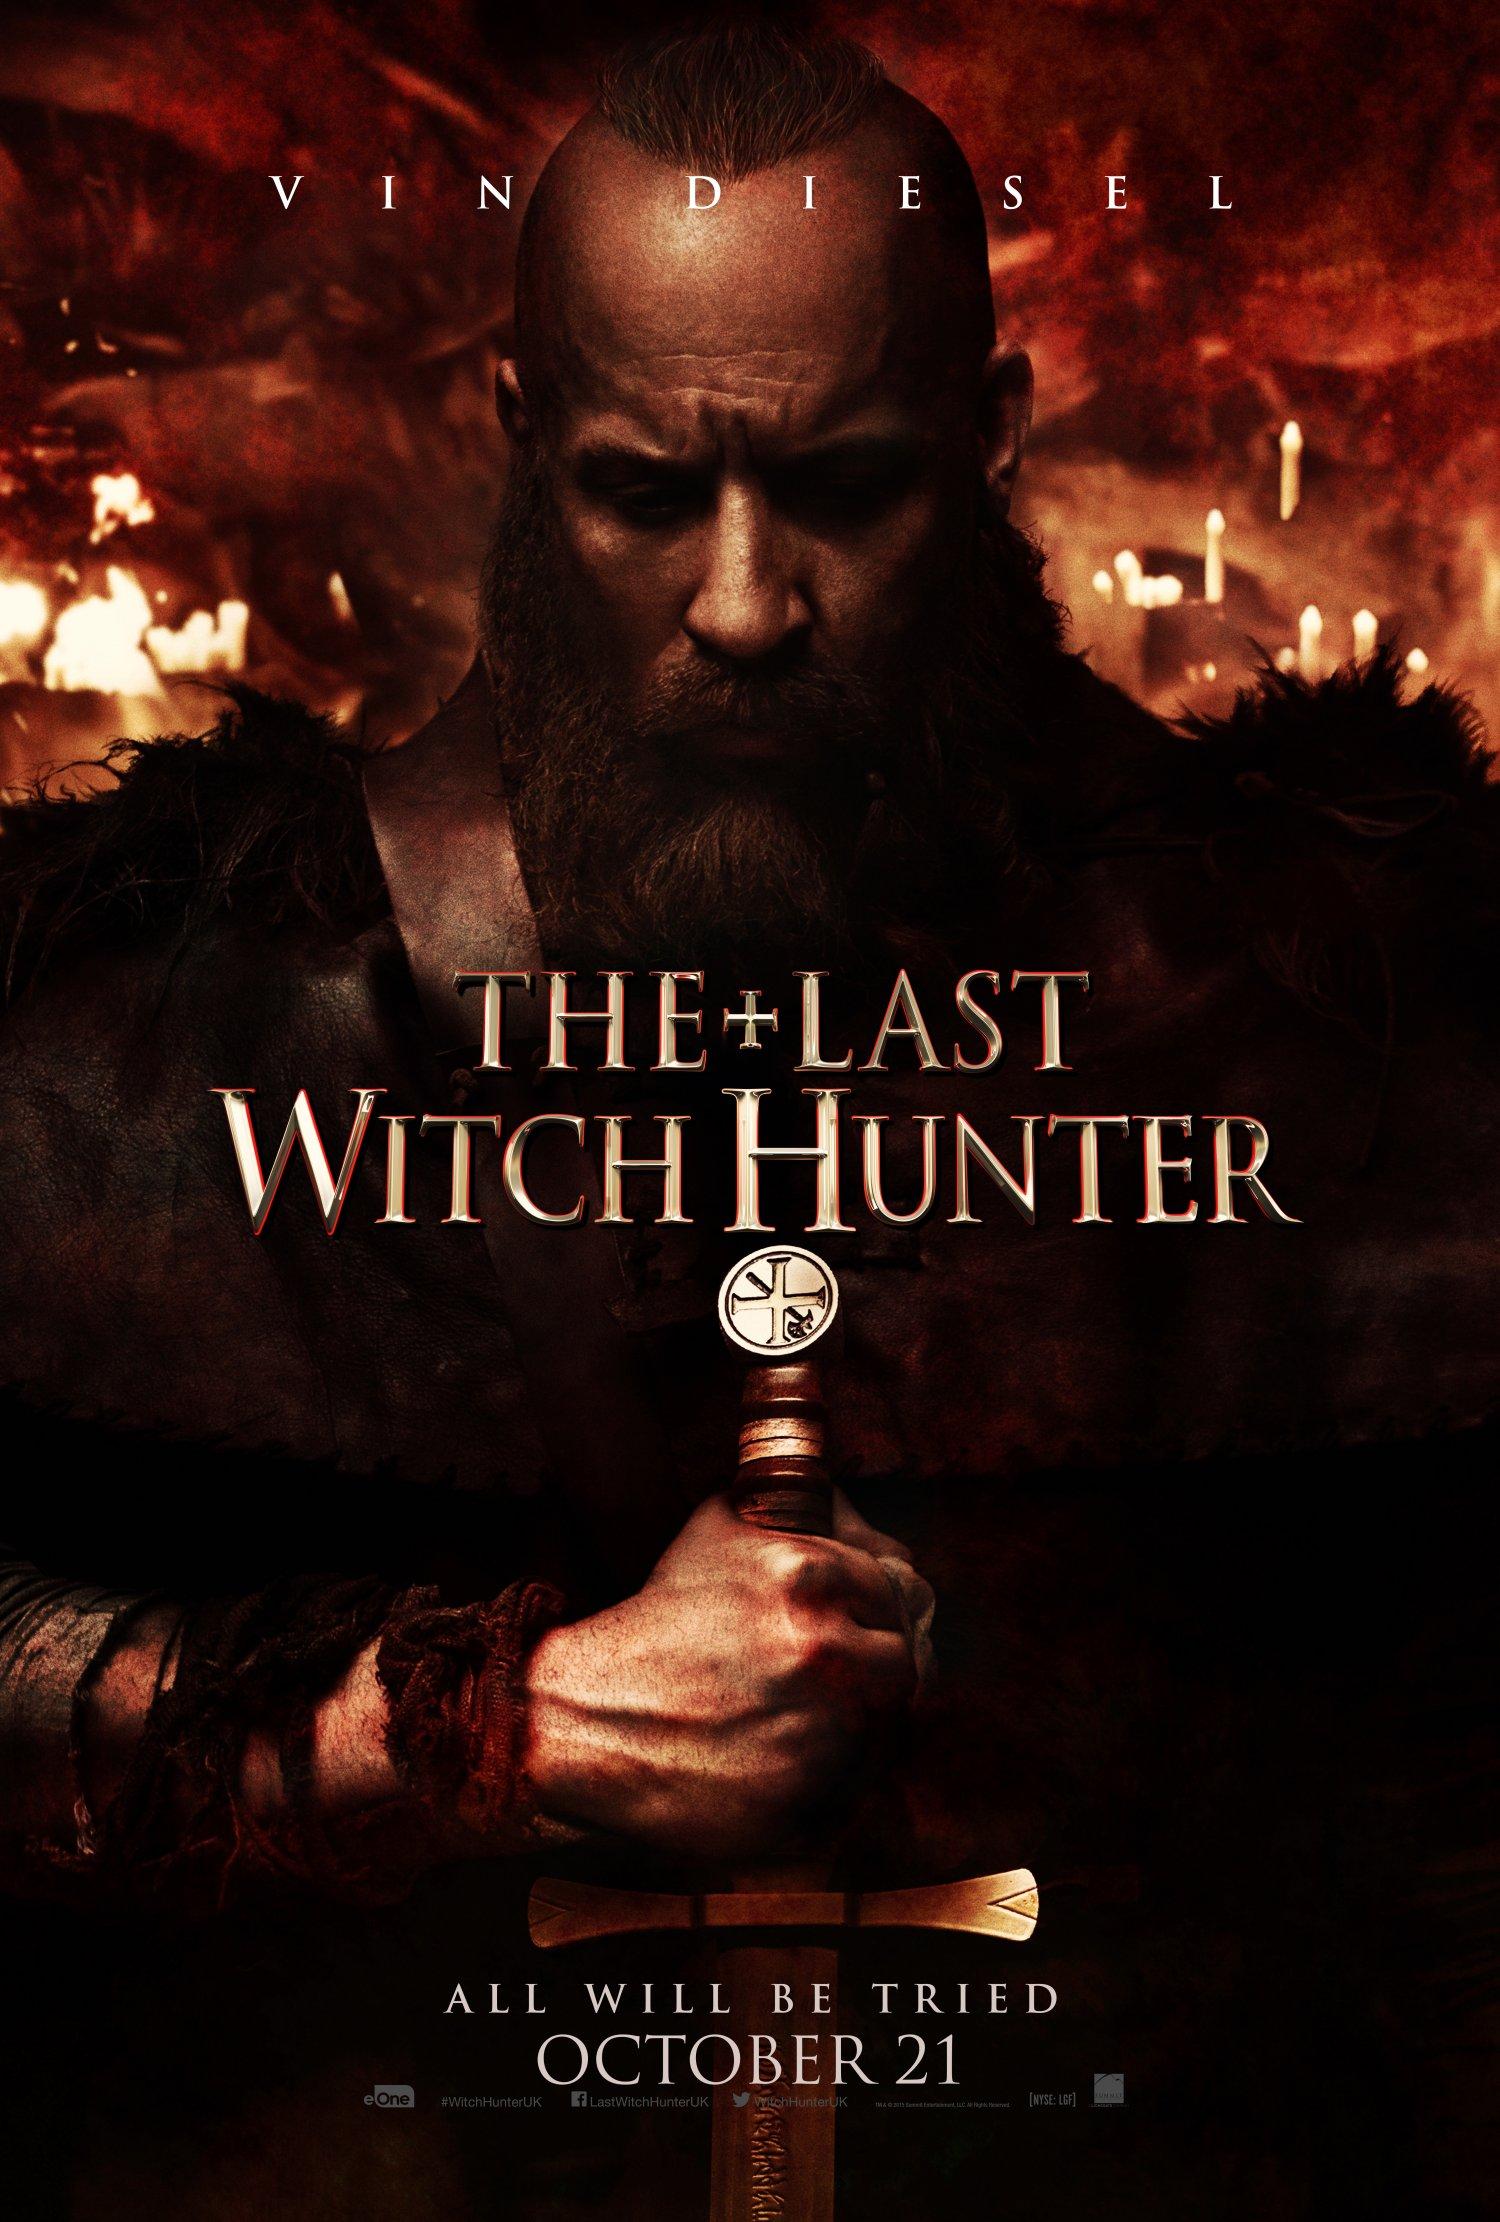 The Last Witch Hunter – Vin Diesel